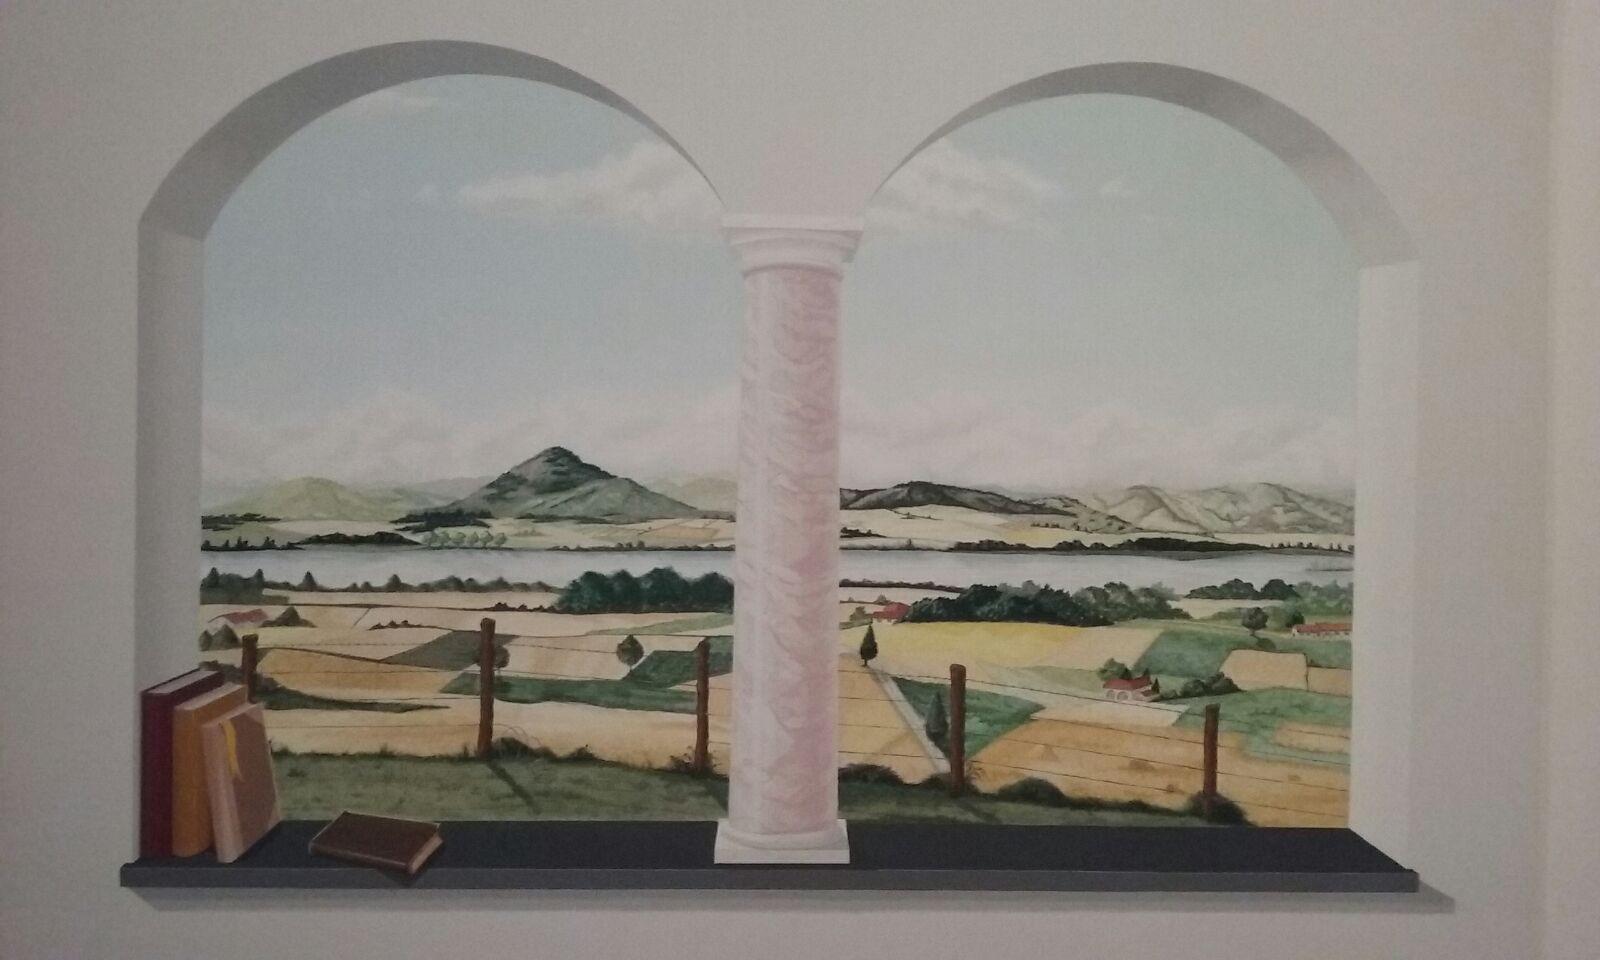 Disegni Sui Muri Di Casa arte sui muri | trompe d'oeil liguria | disegni su muro